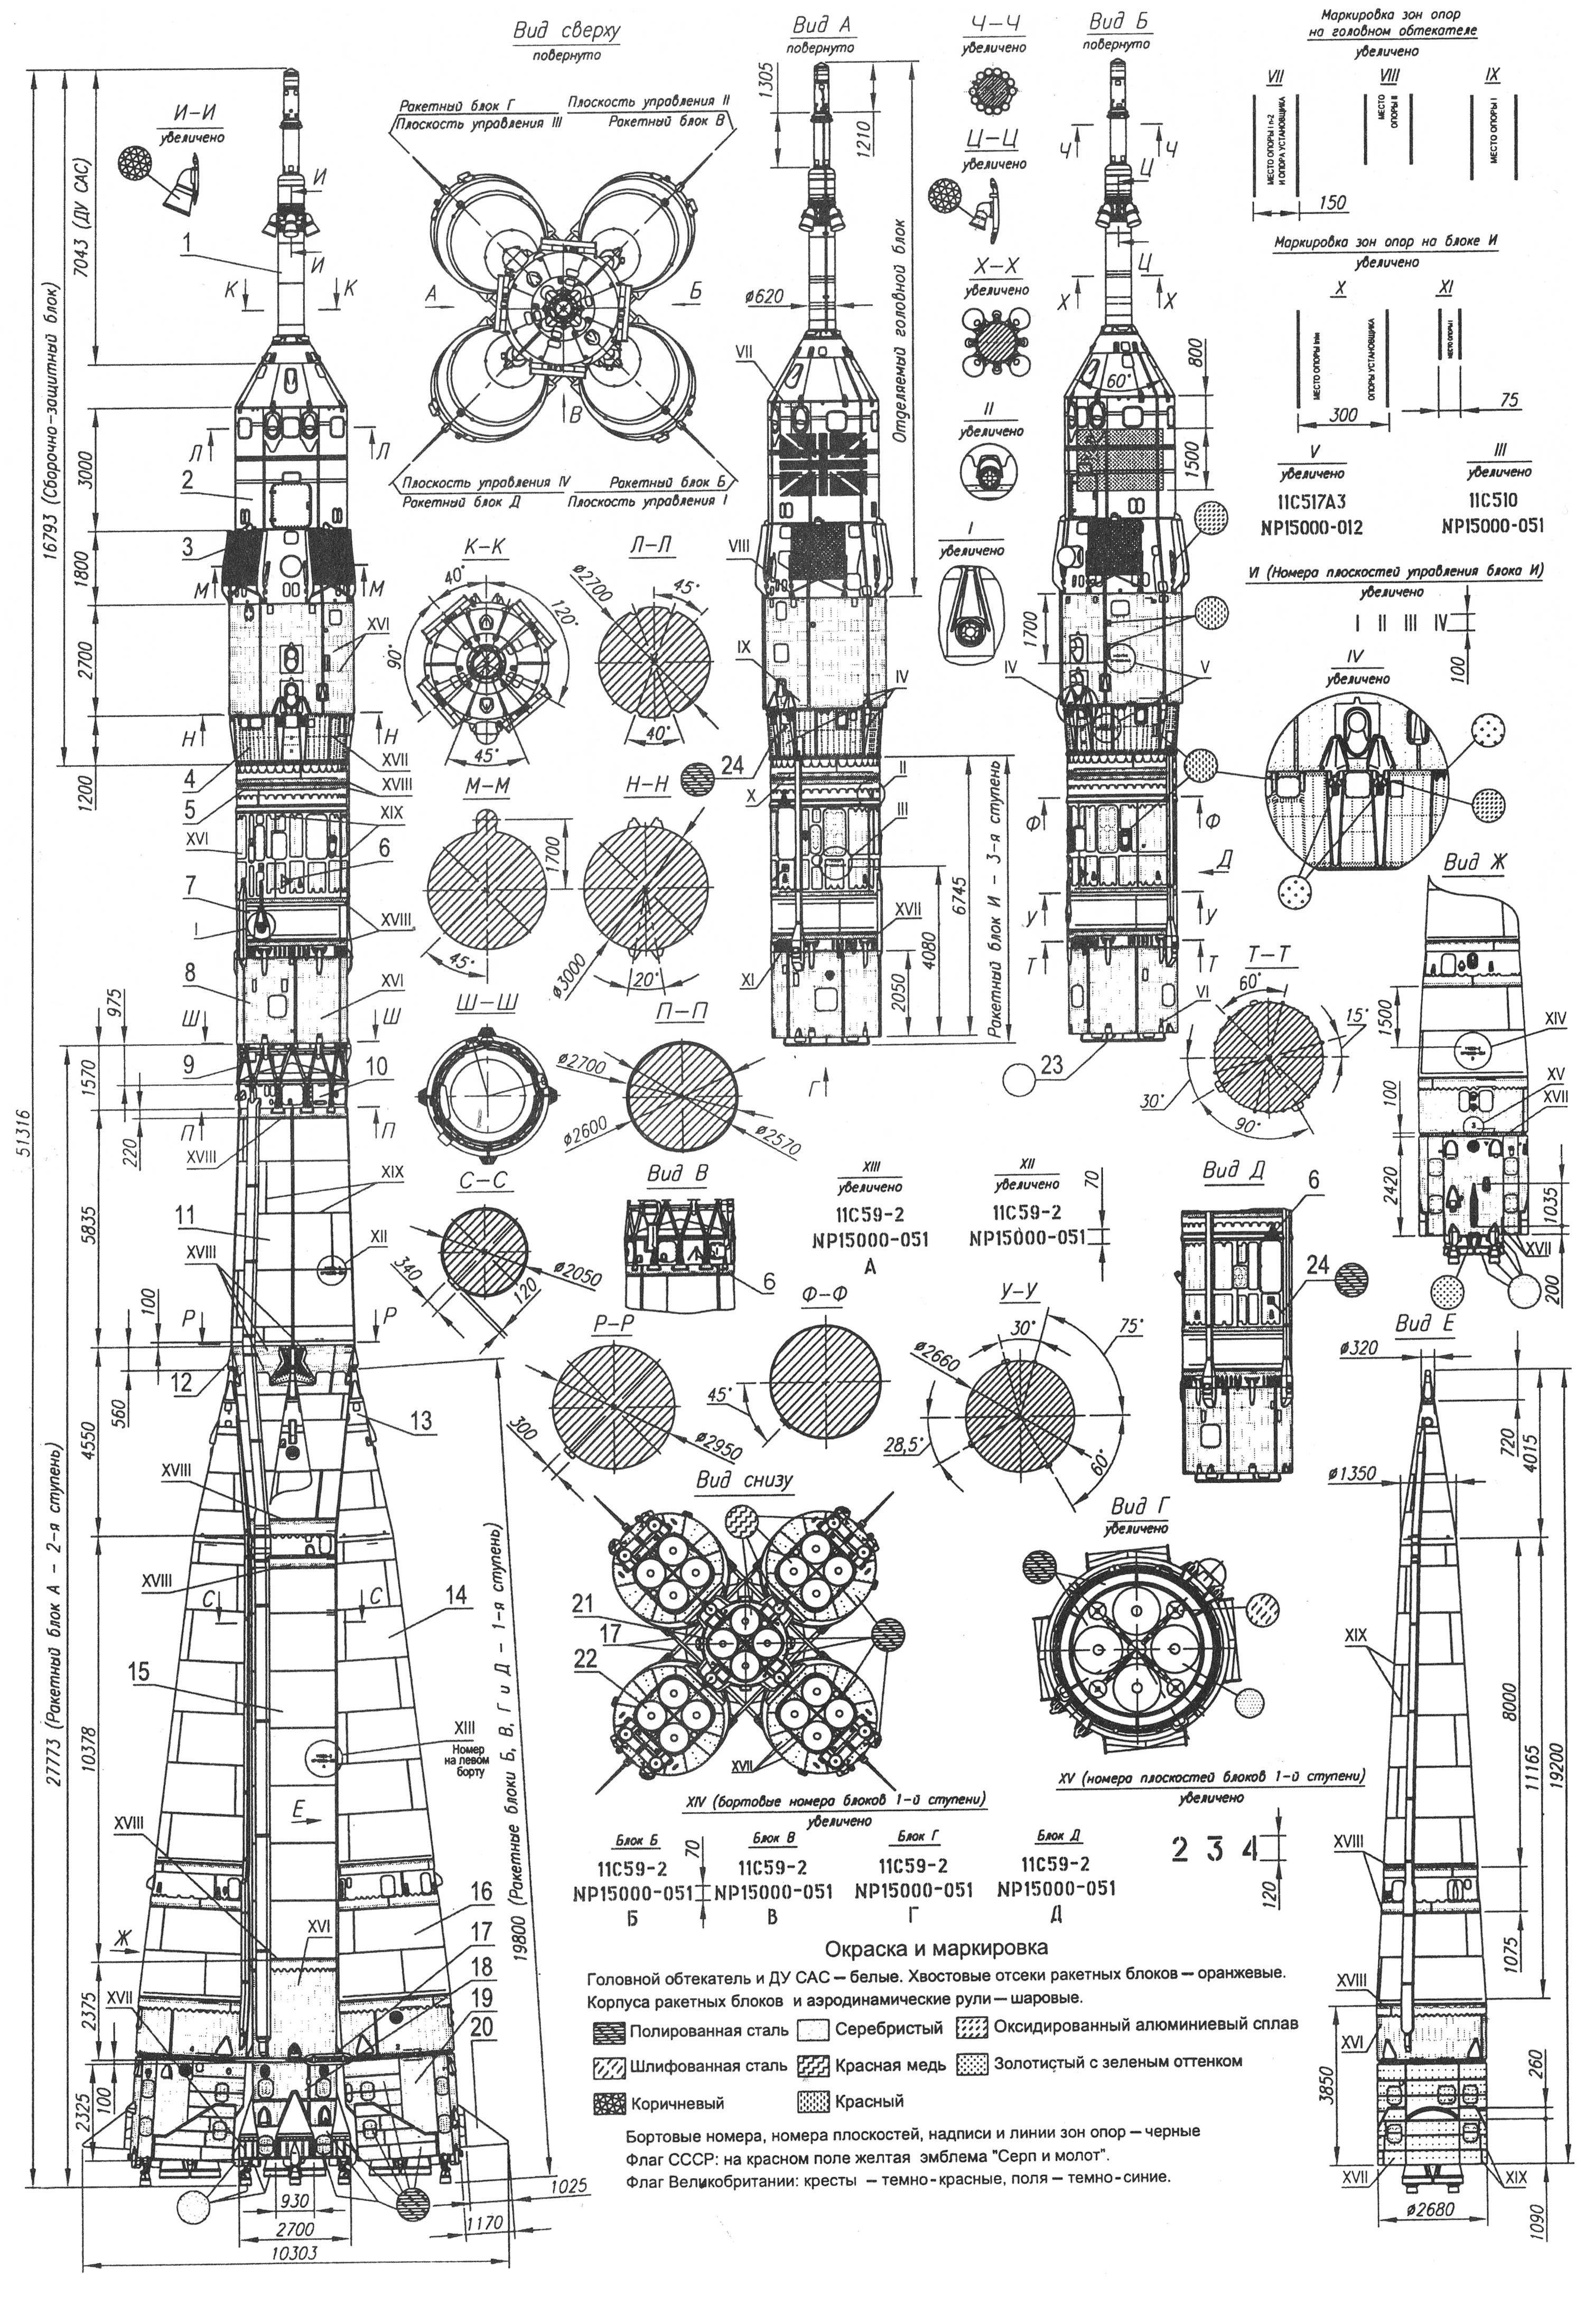 Old fashioned toy car blueprint embellishment electrical diagram luxury blueprint auto parts pattern wiring diagram ideas malvernweather Choice Image